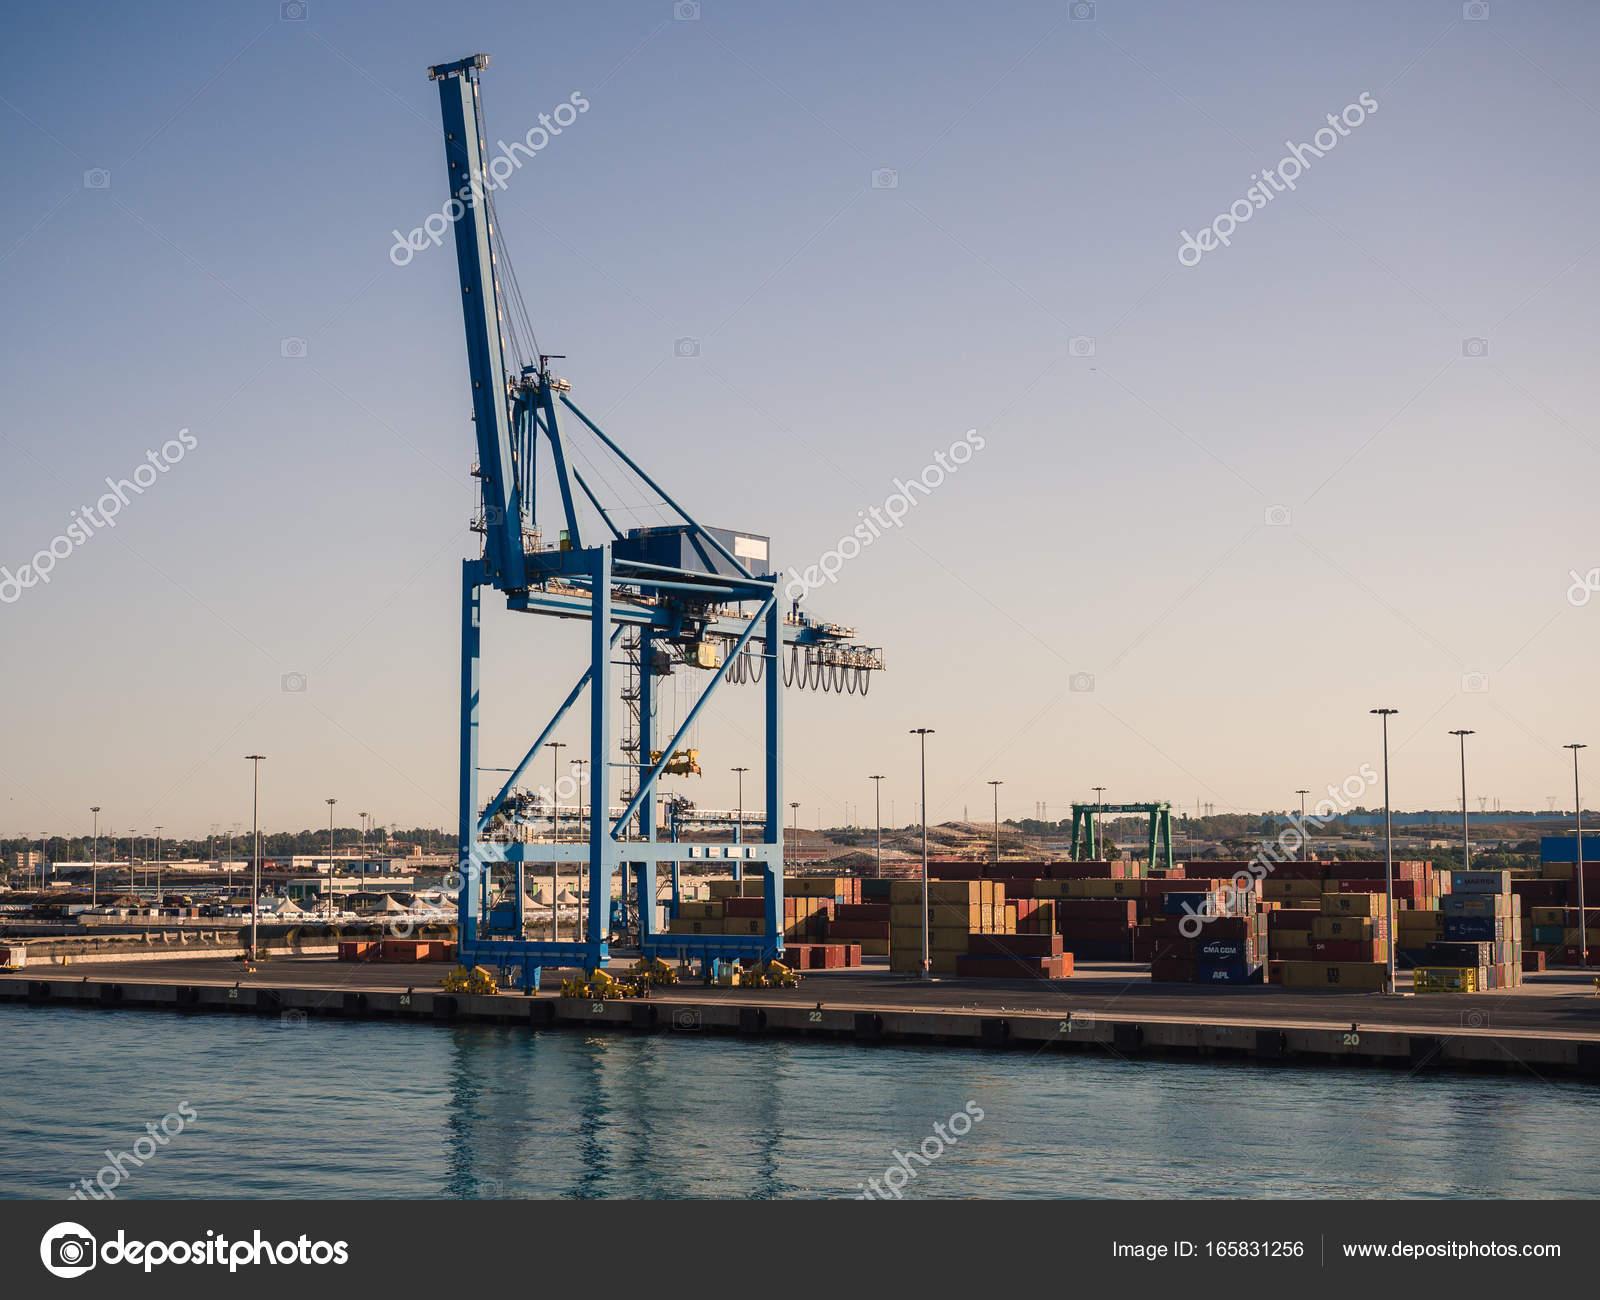 Shipping industrial trade port  Crane bridge and import